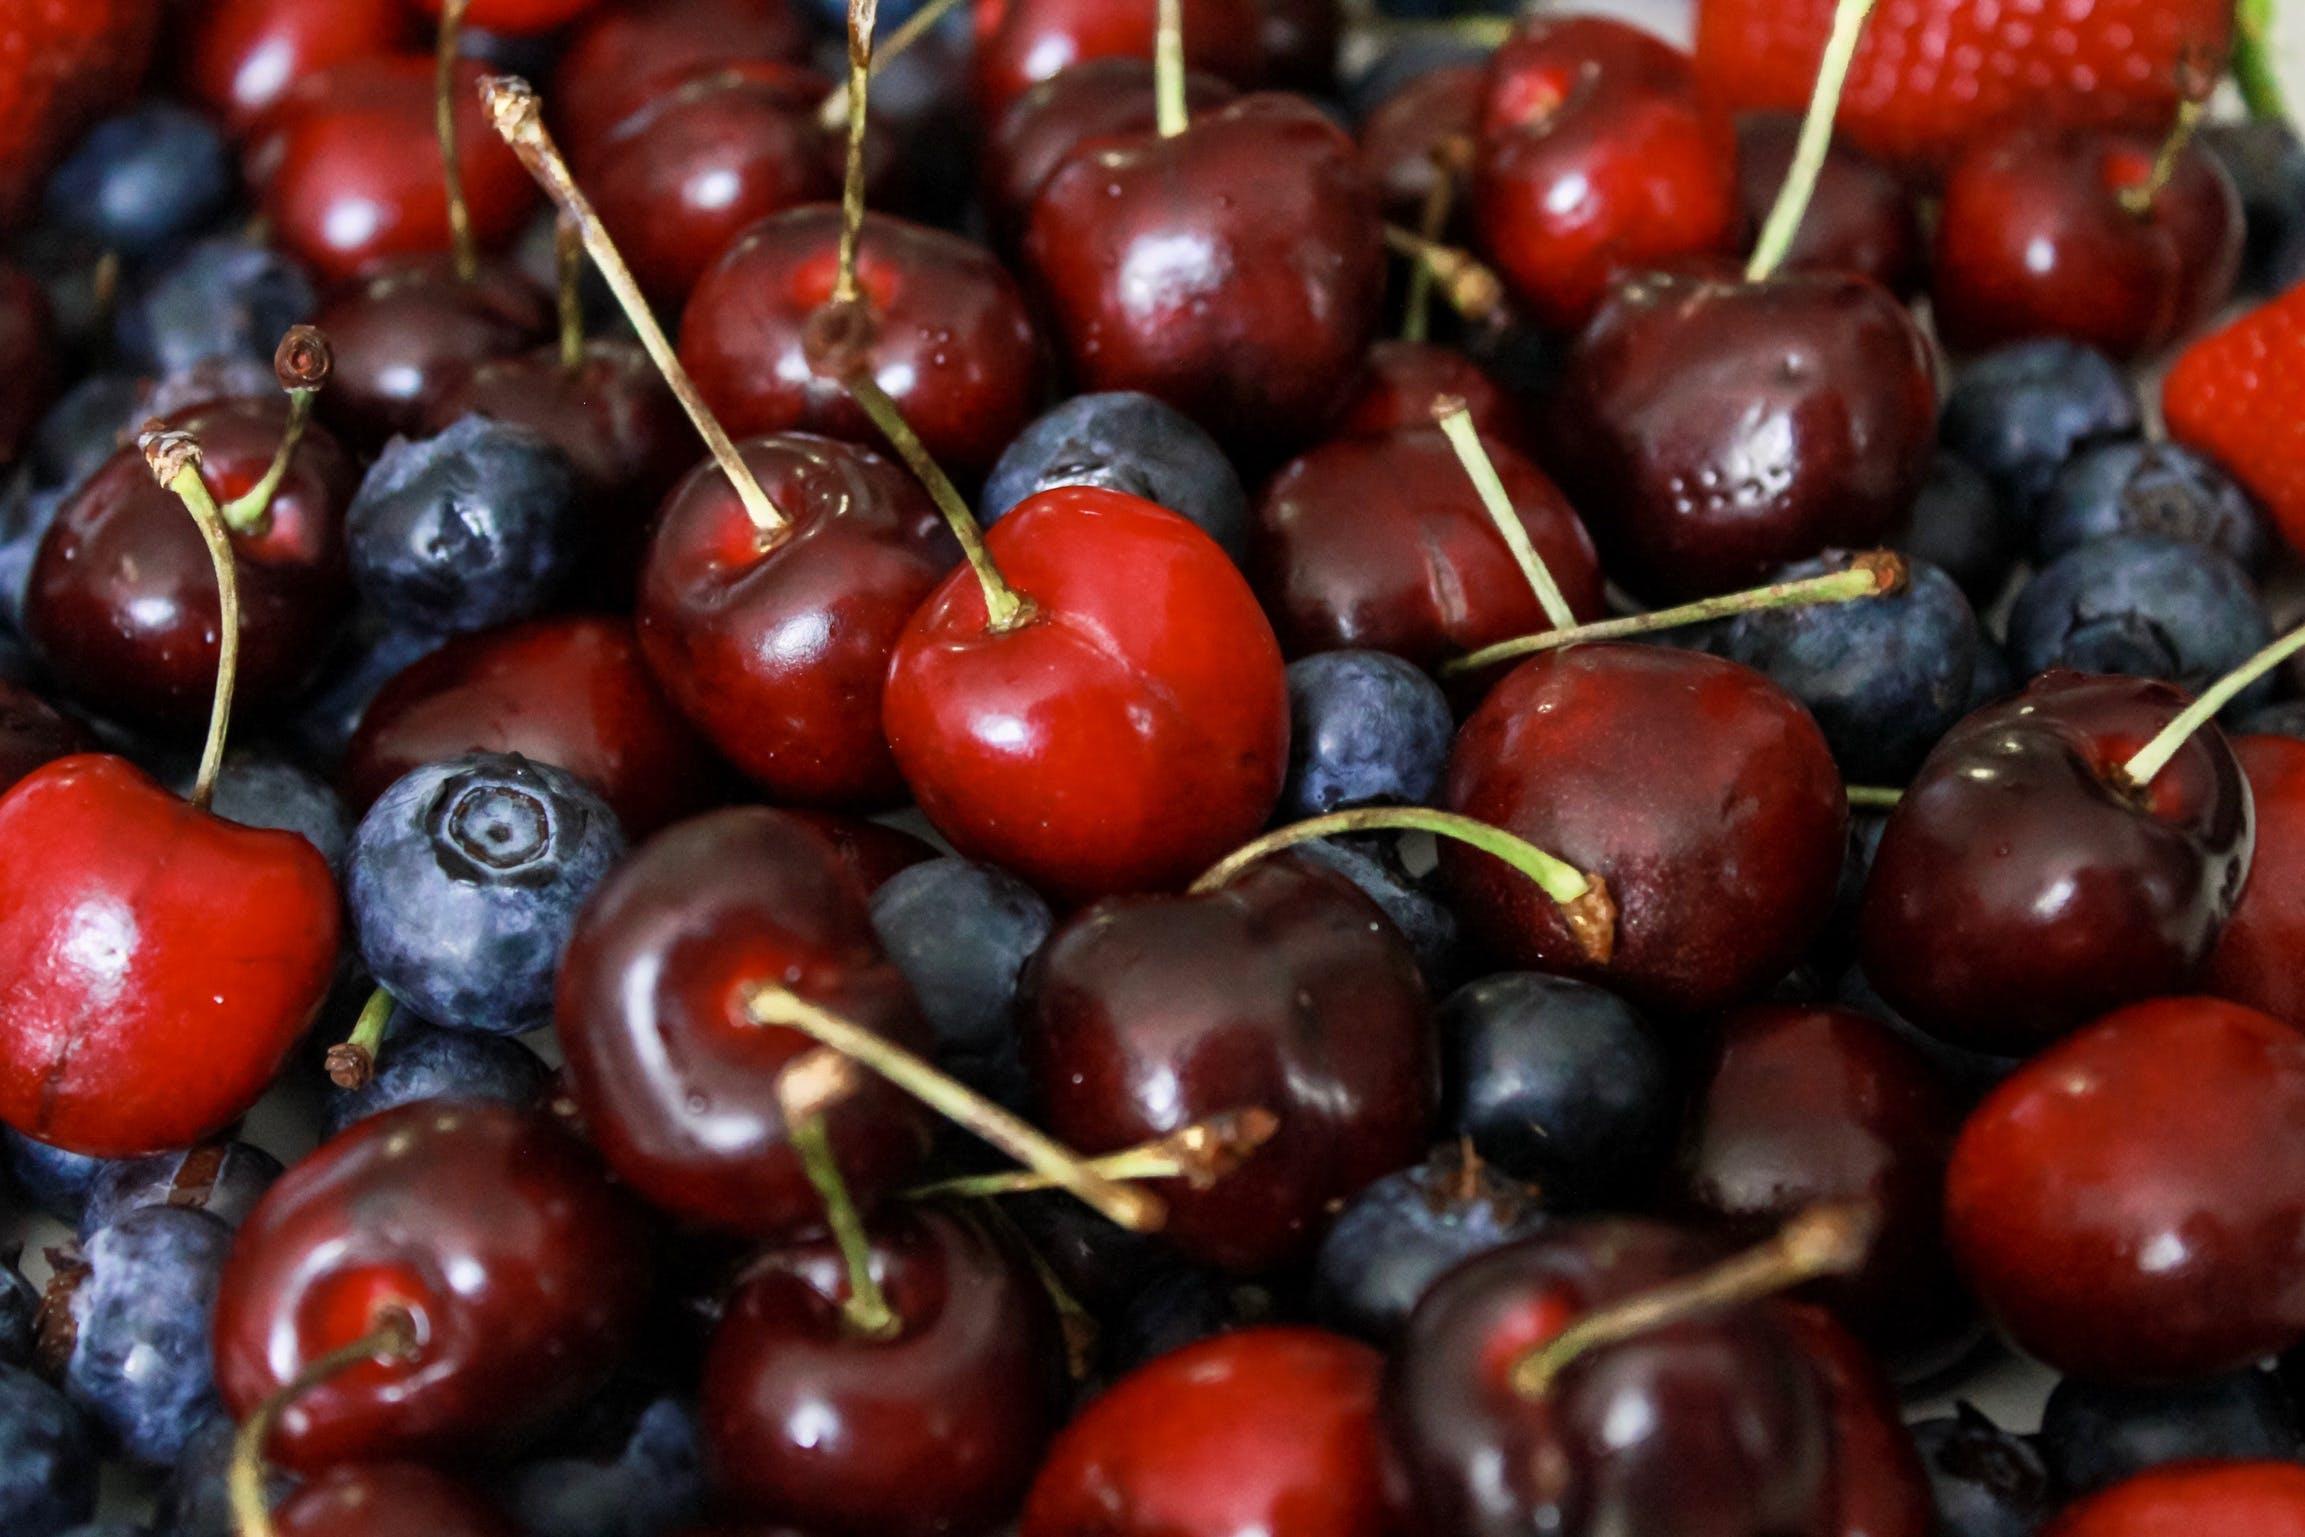 Closeup Photo of Bunch of Cherries